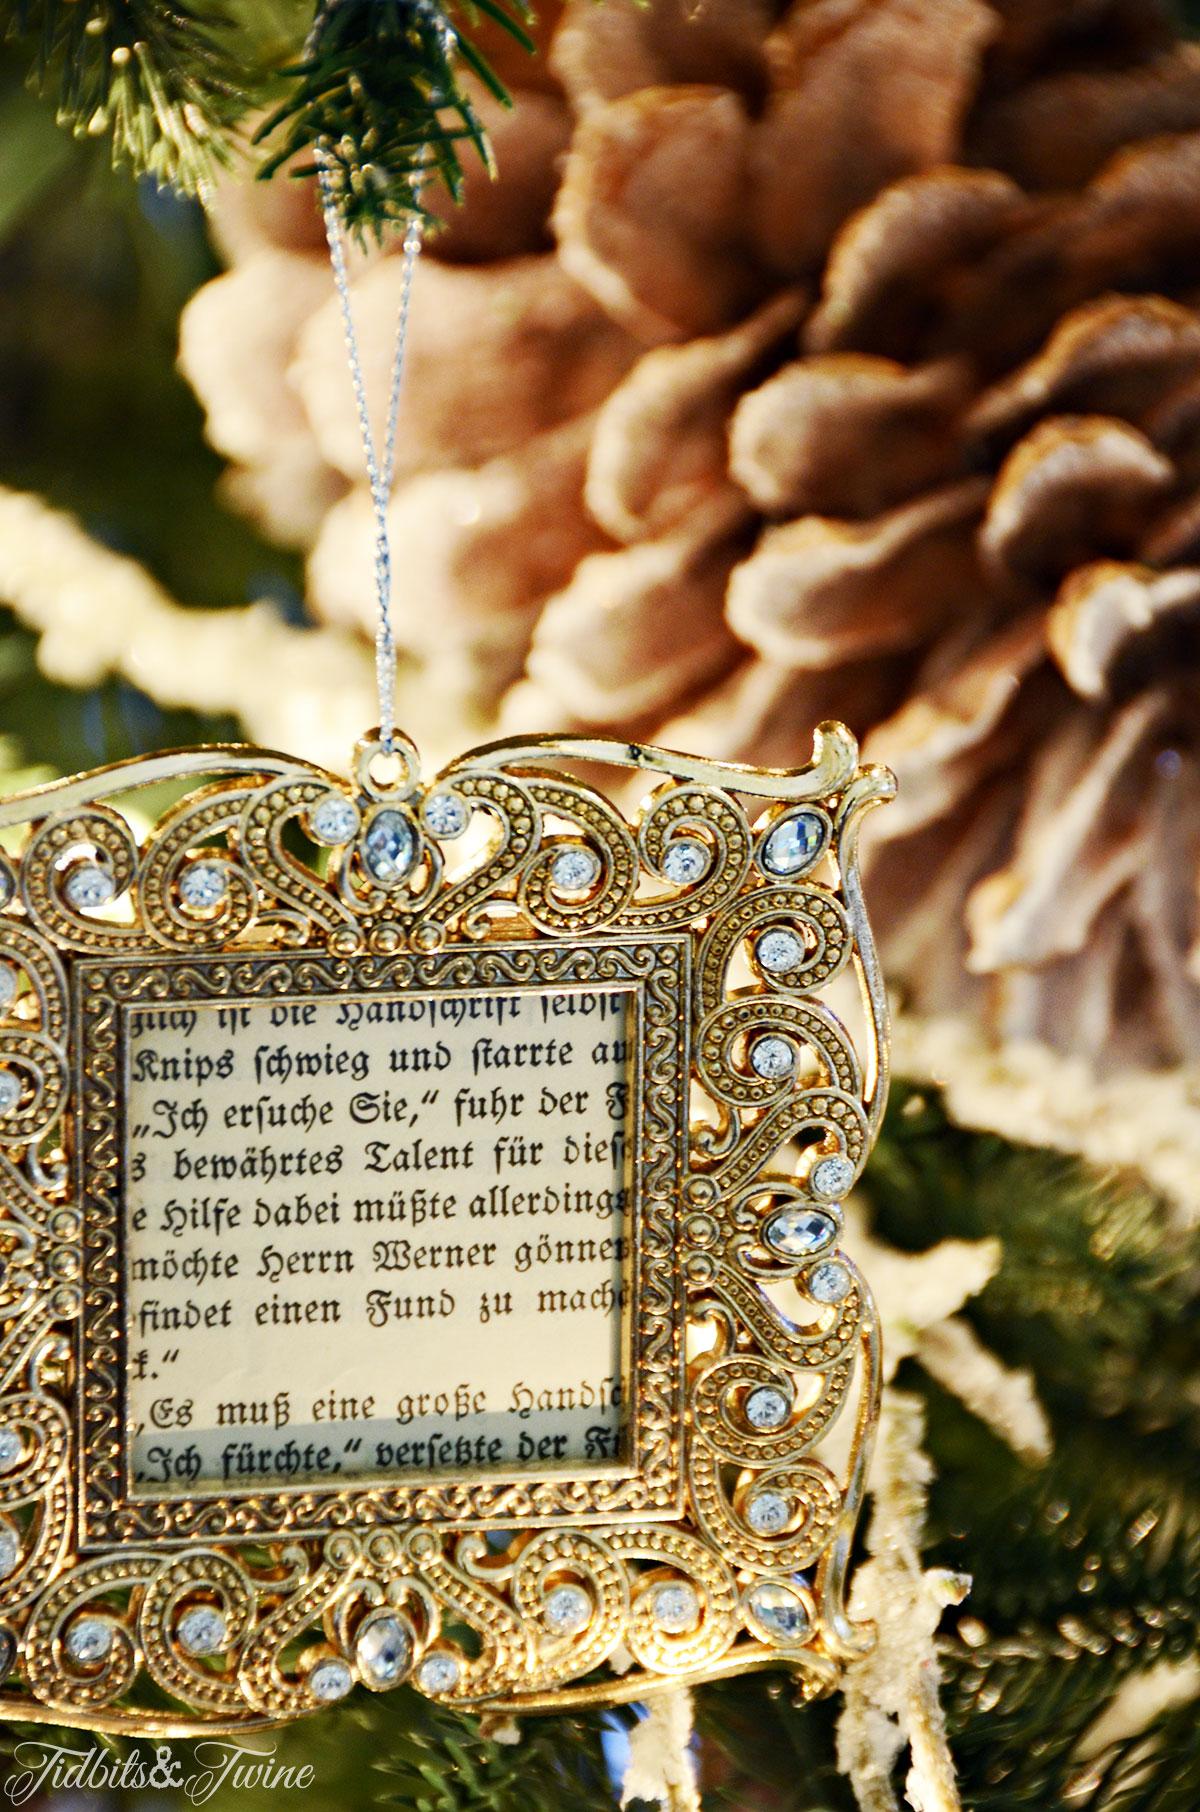 Tidbitstwine Christmas Tree 2015 Gold Frame Ornament Tidbitstwine